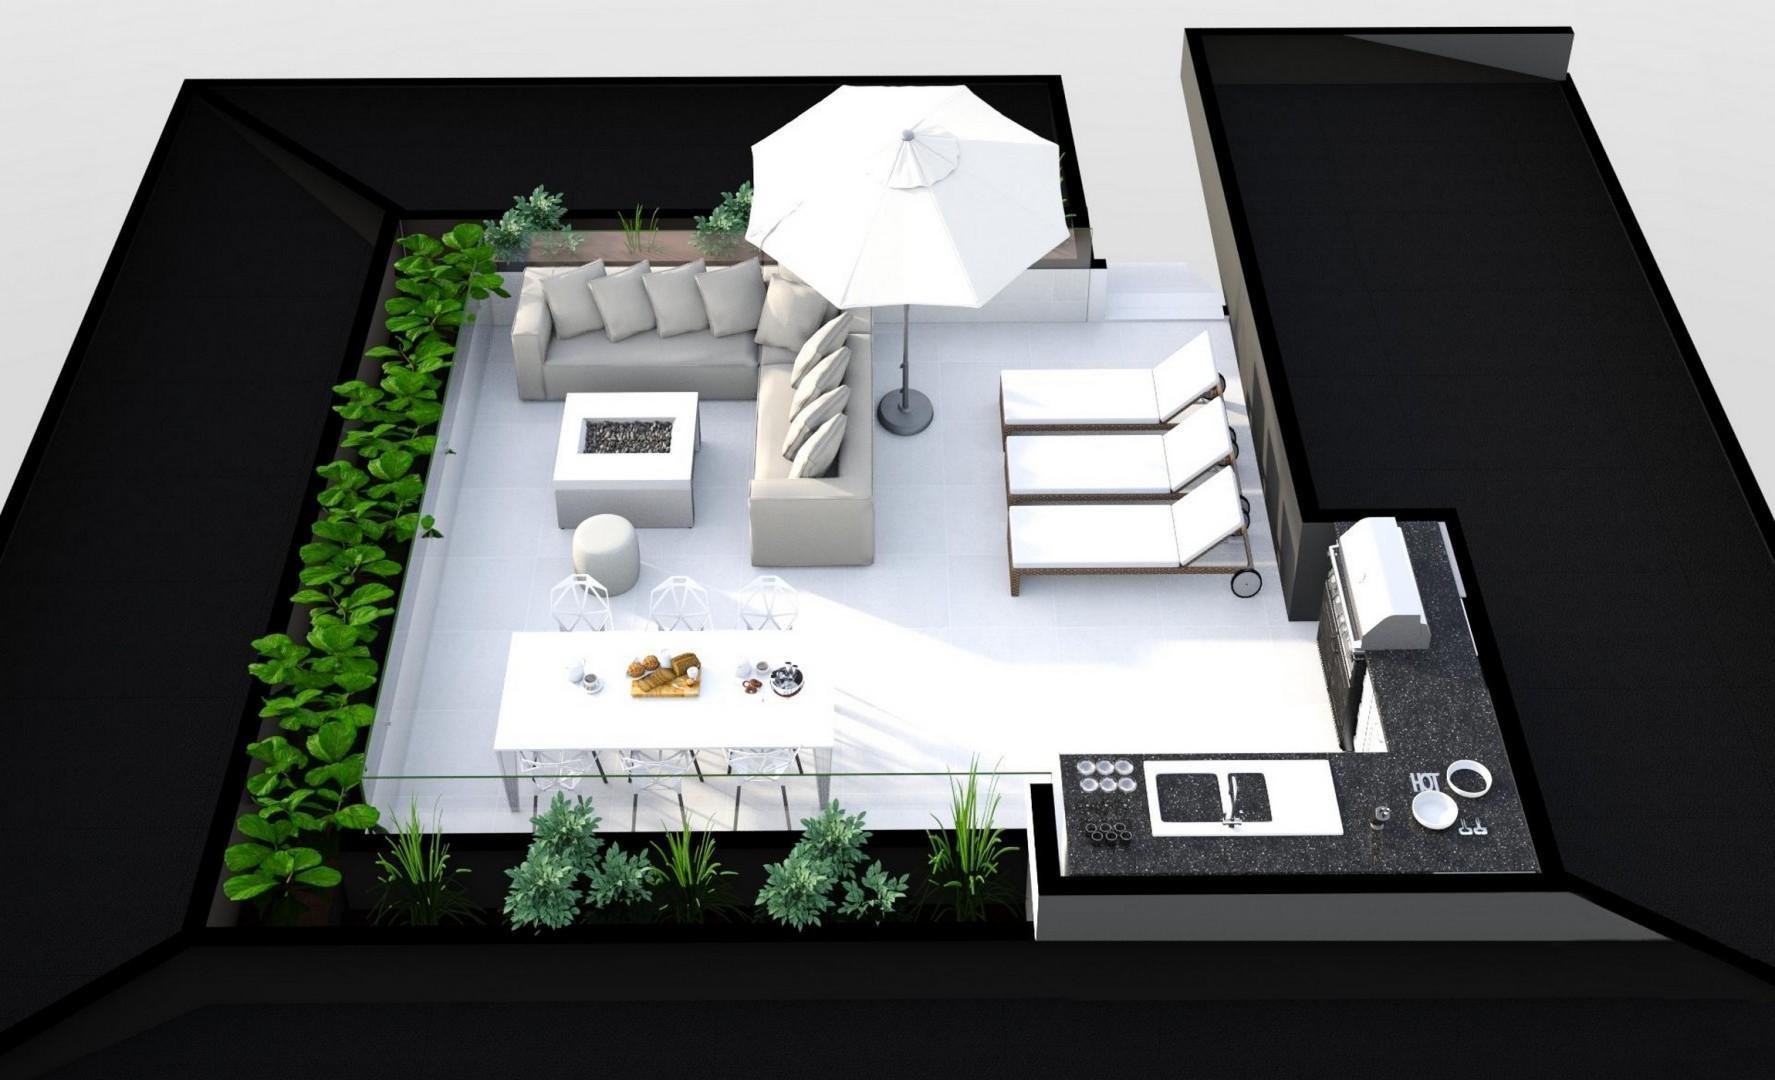 Panoramic view rooftop deck rendering